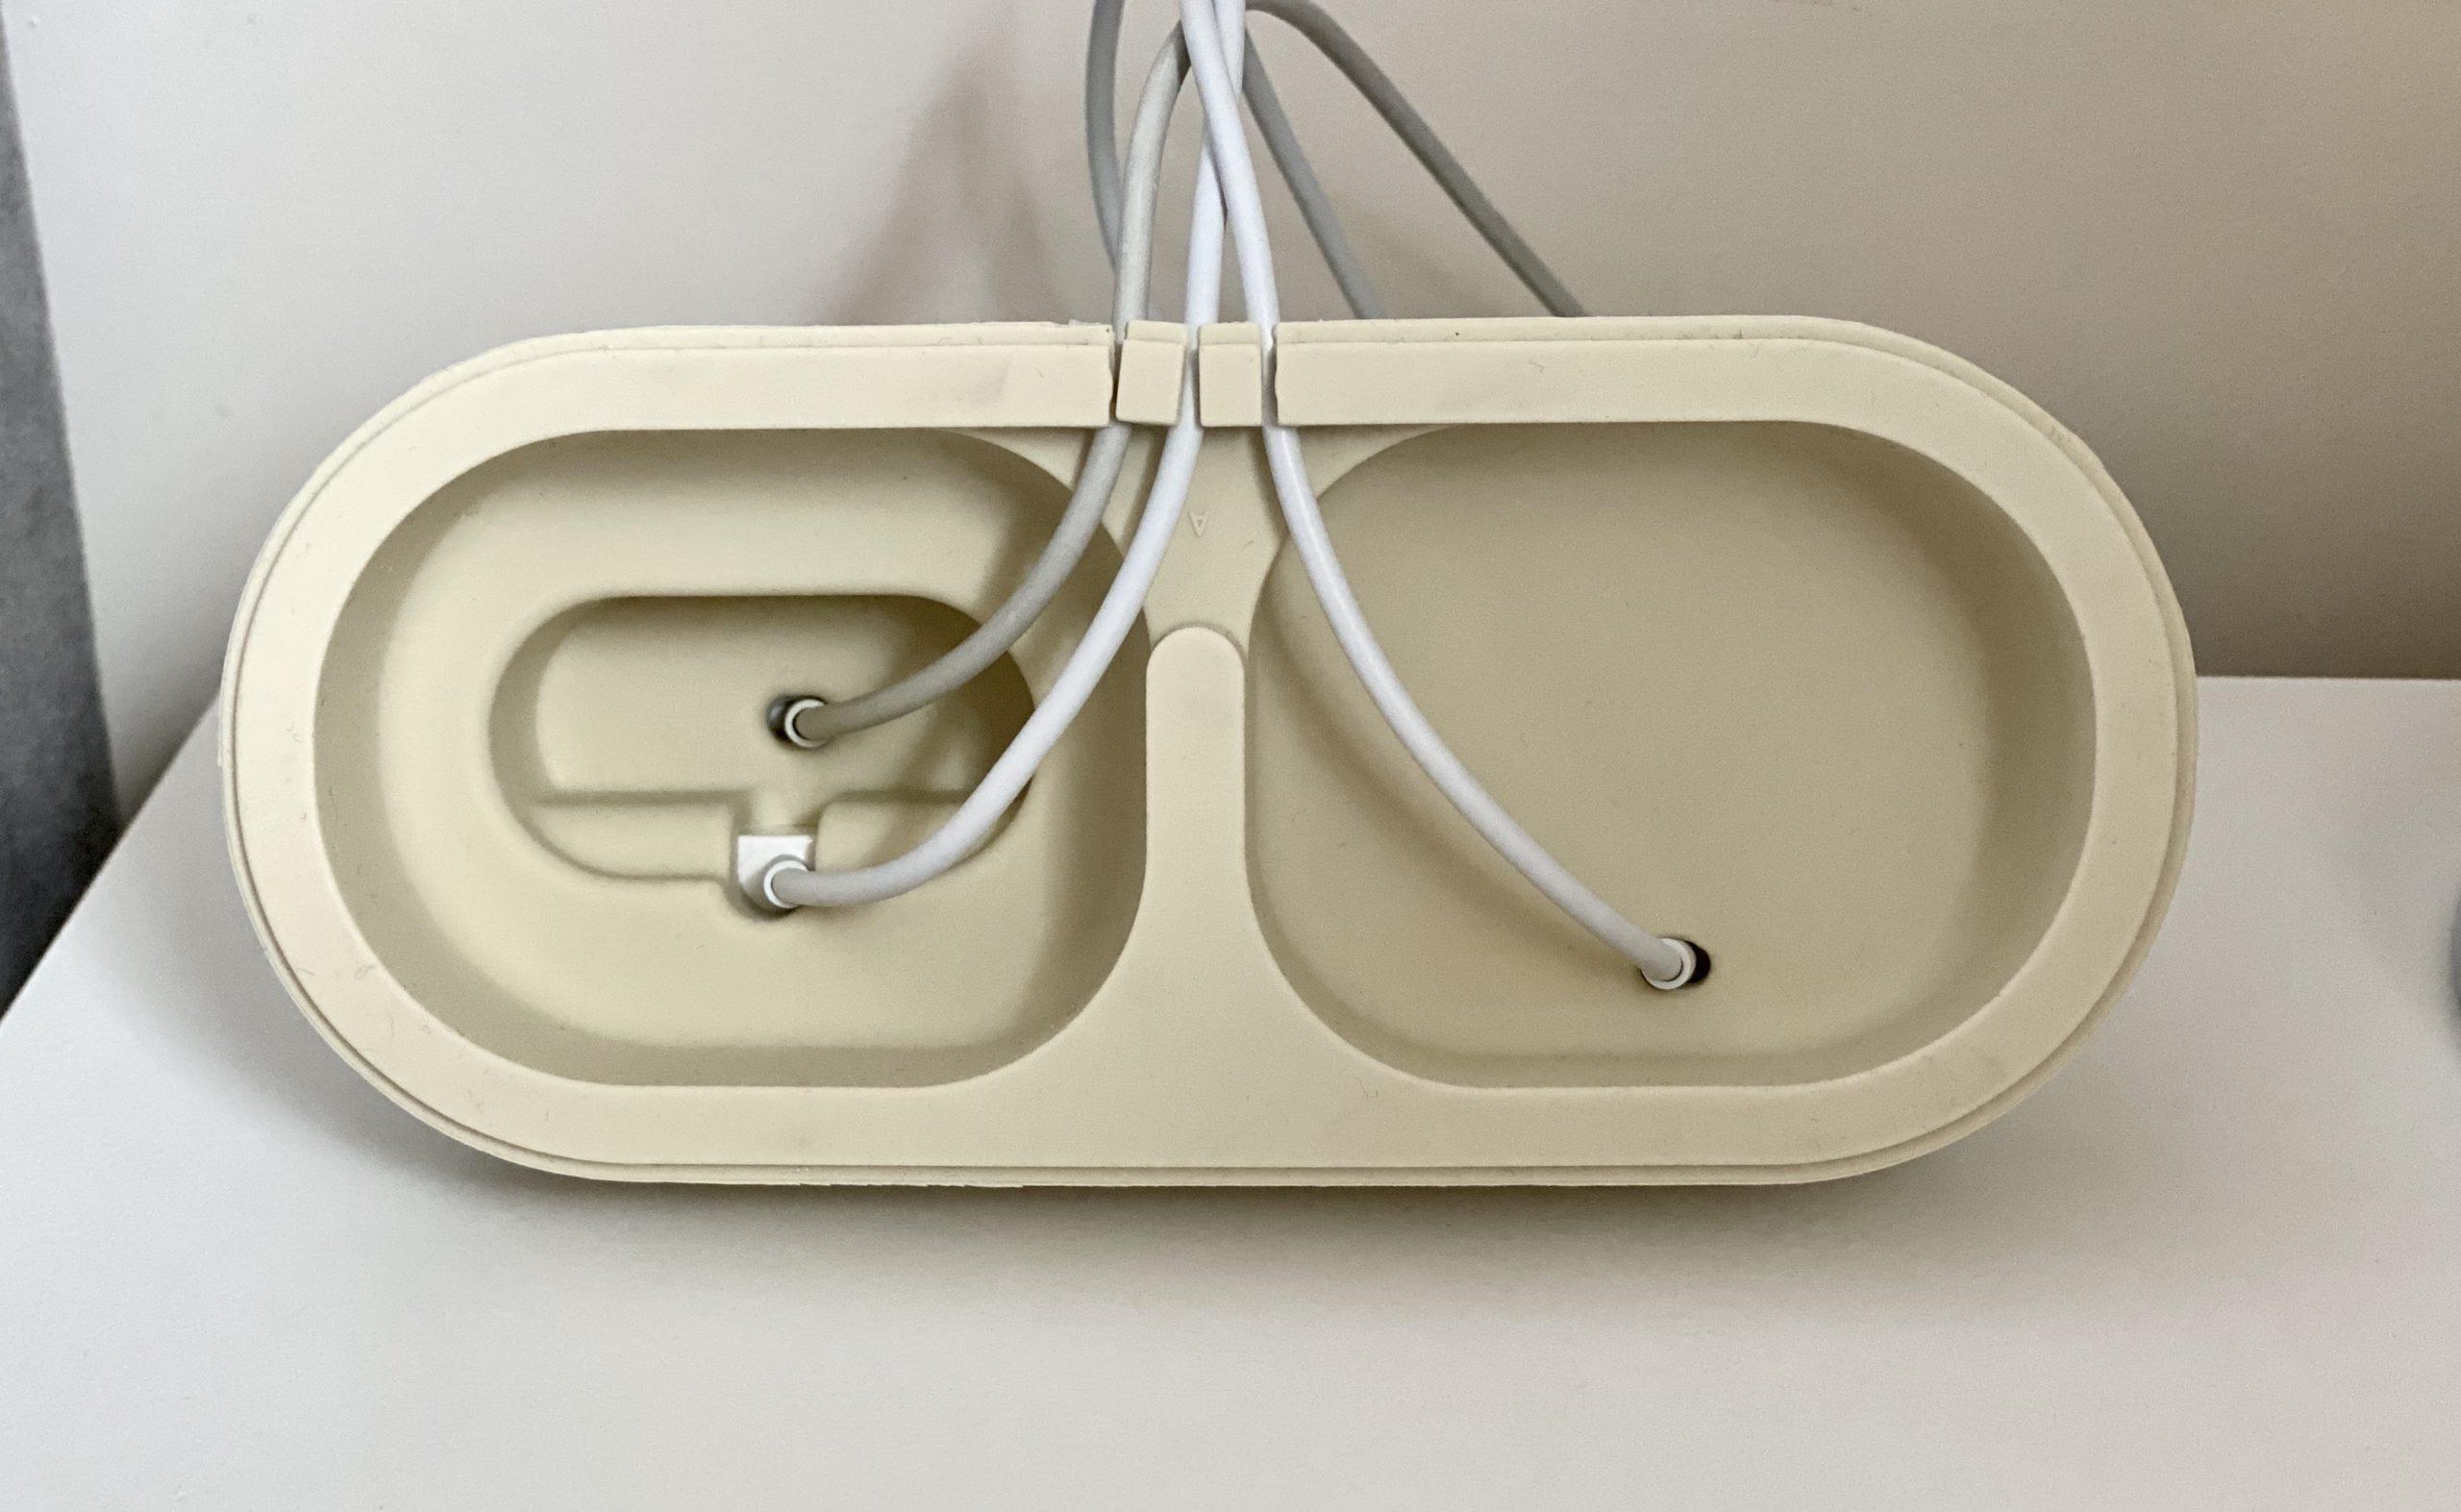 Elago-charging-hub-2